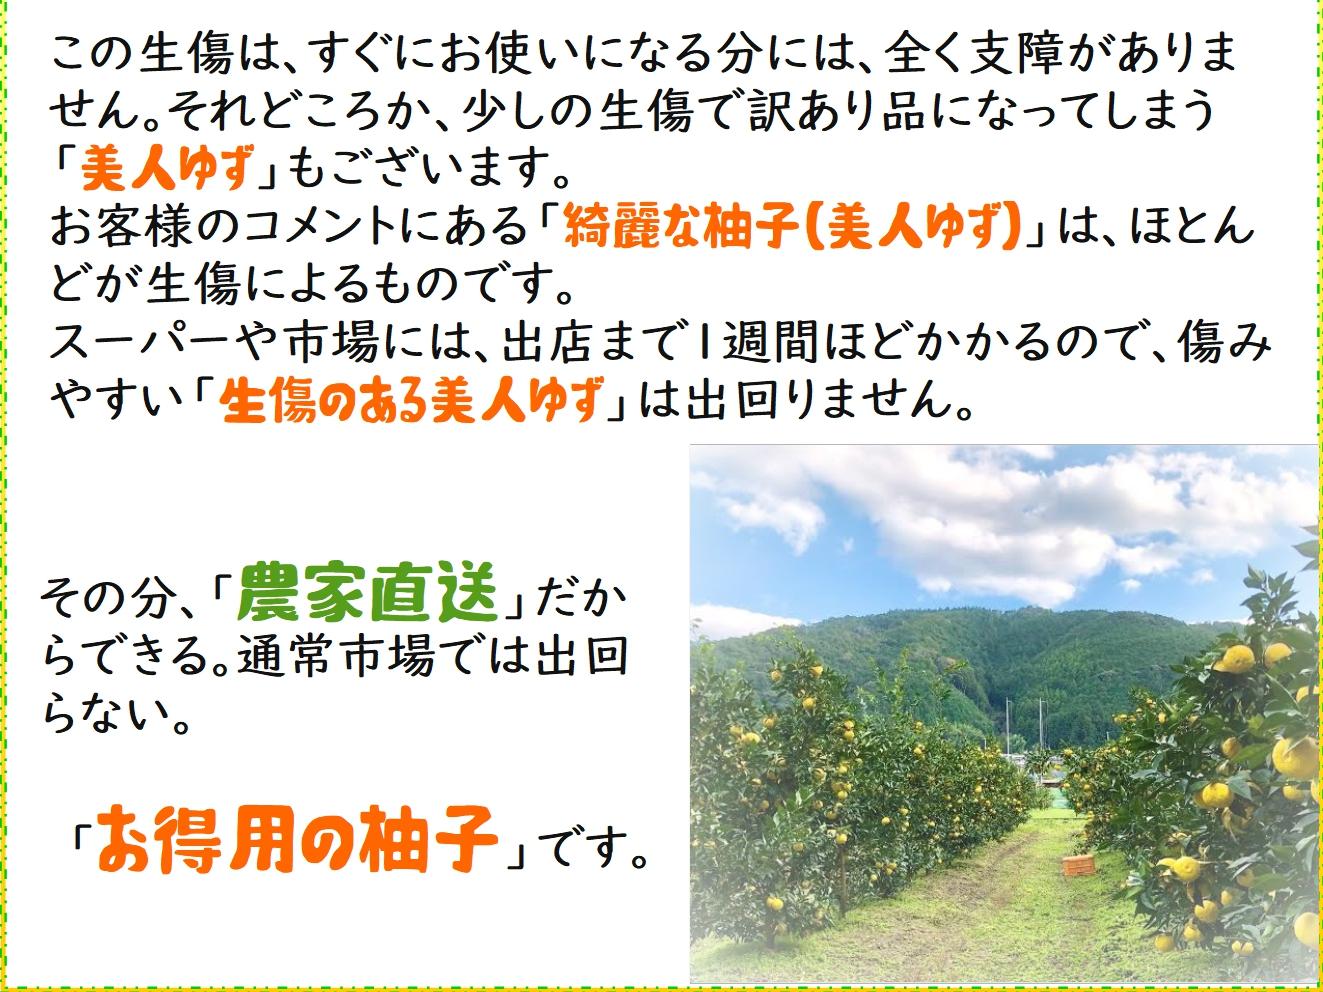 yuzu059.jpg